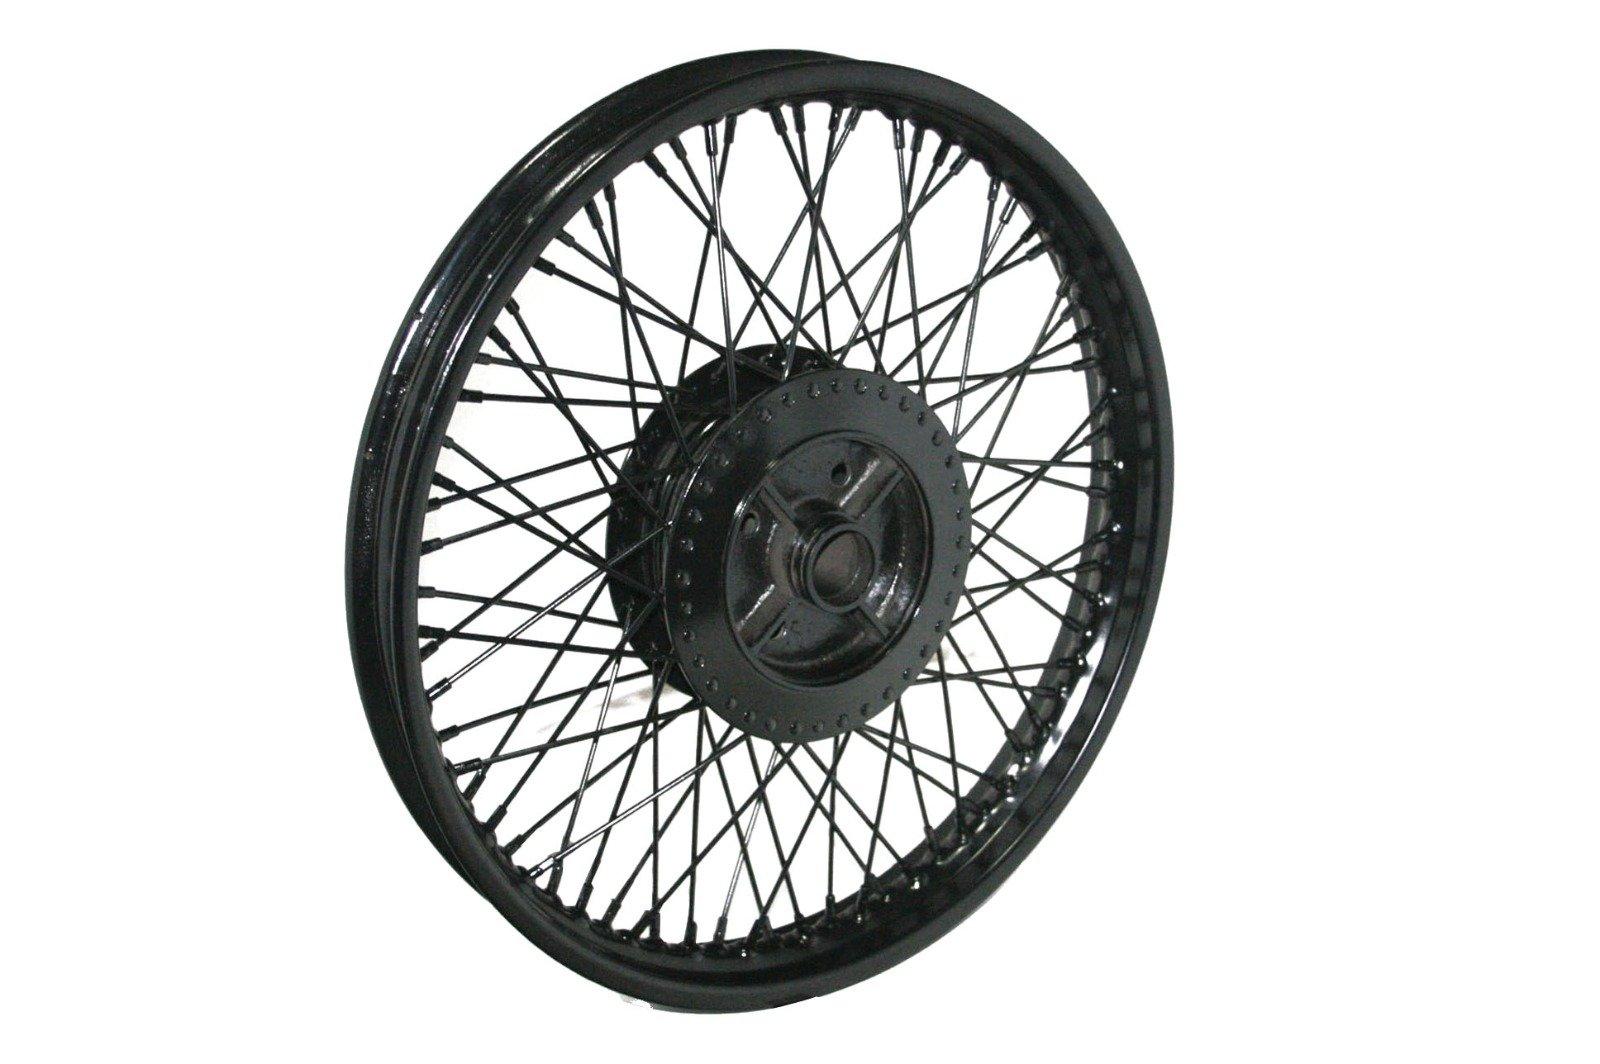 Enfield County 72 Spoke Rear Black Powder Steel Wheel Rim Wm2-19'' Royal Enfield Bullet